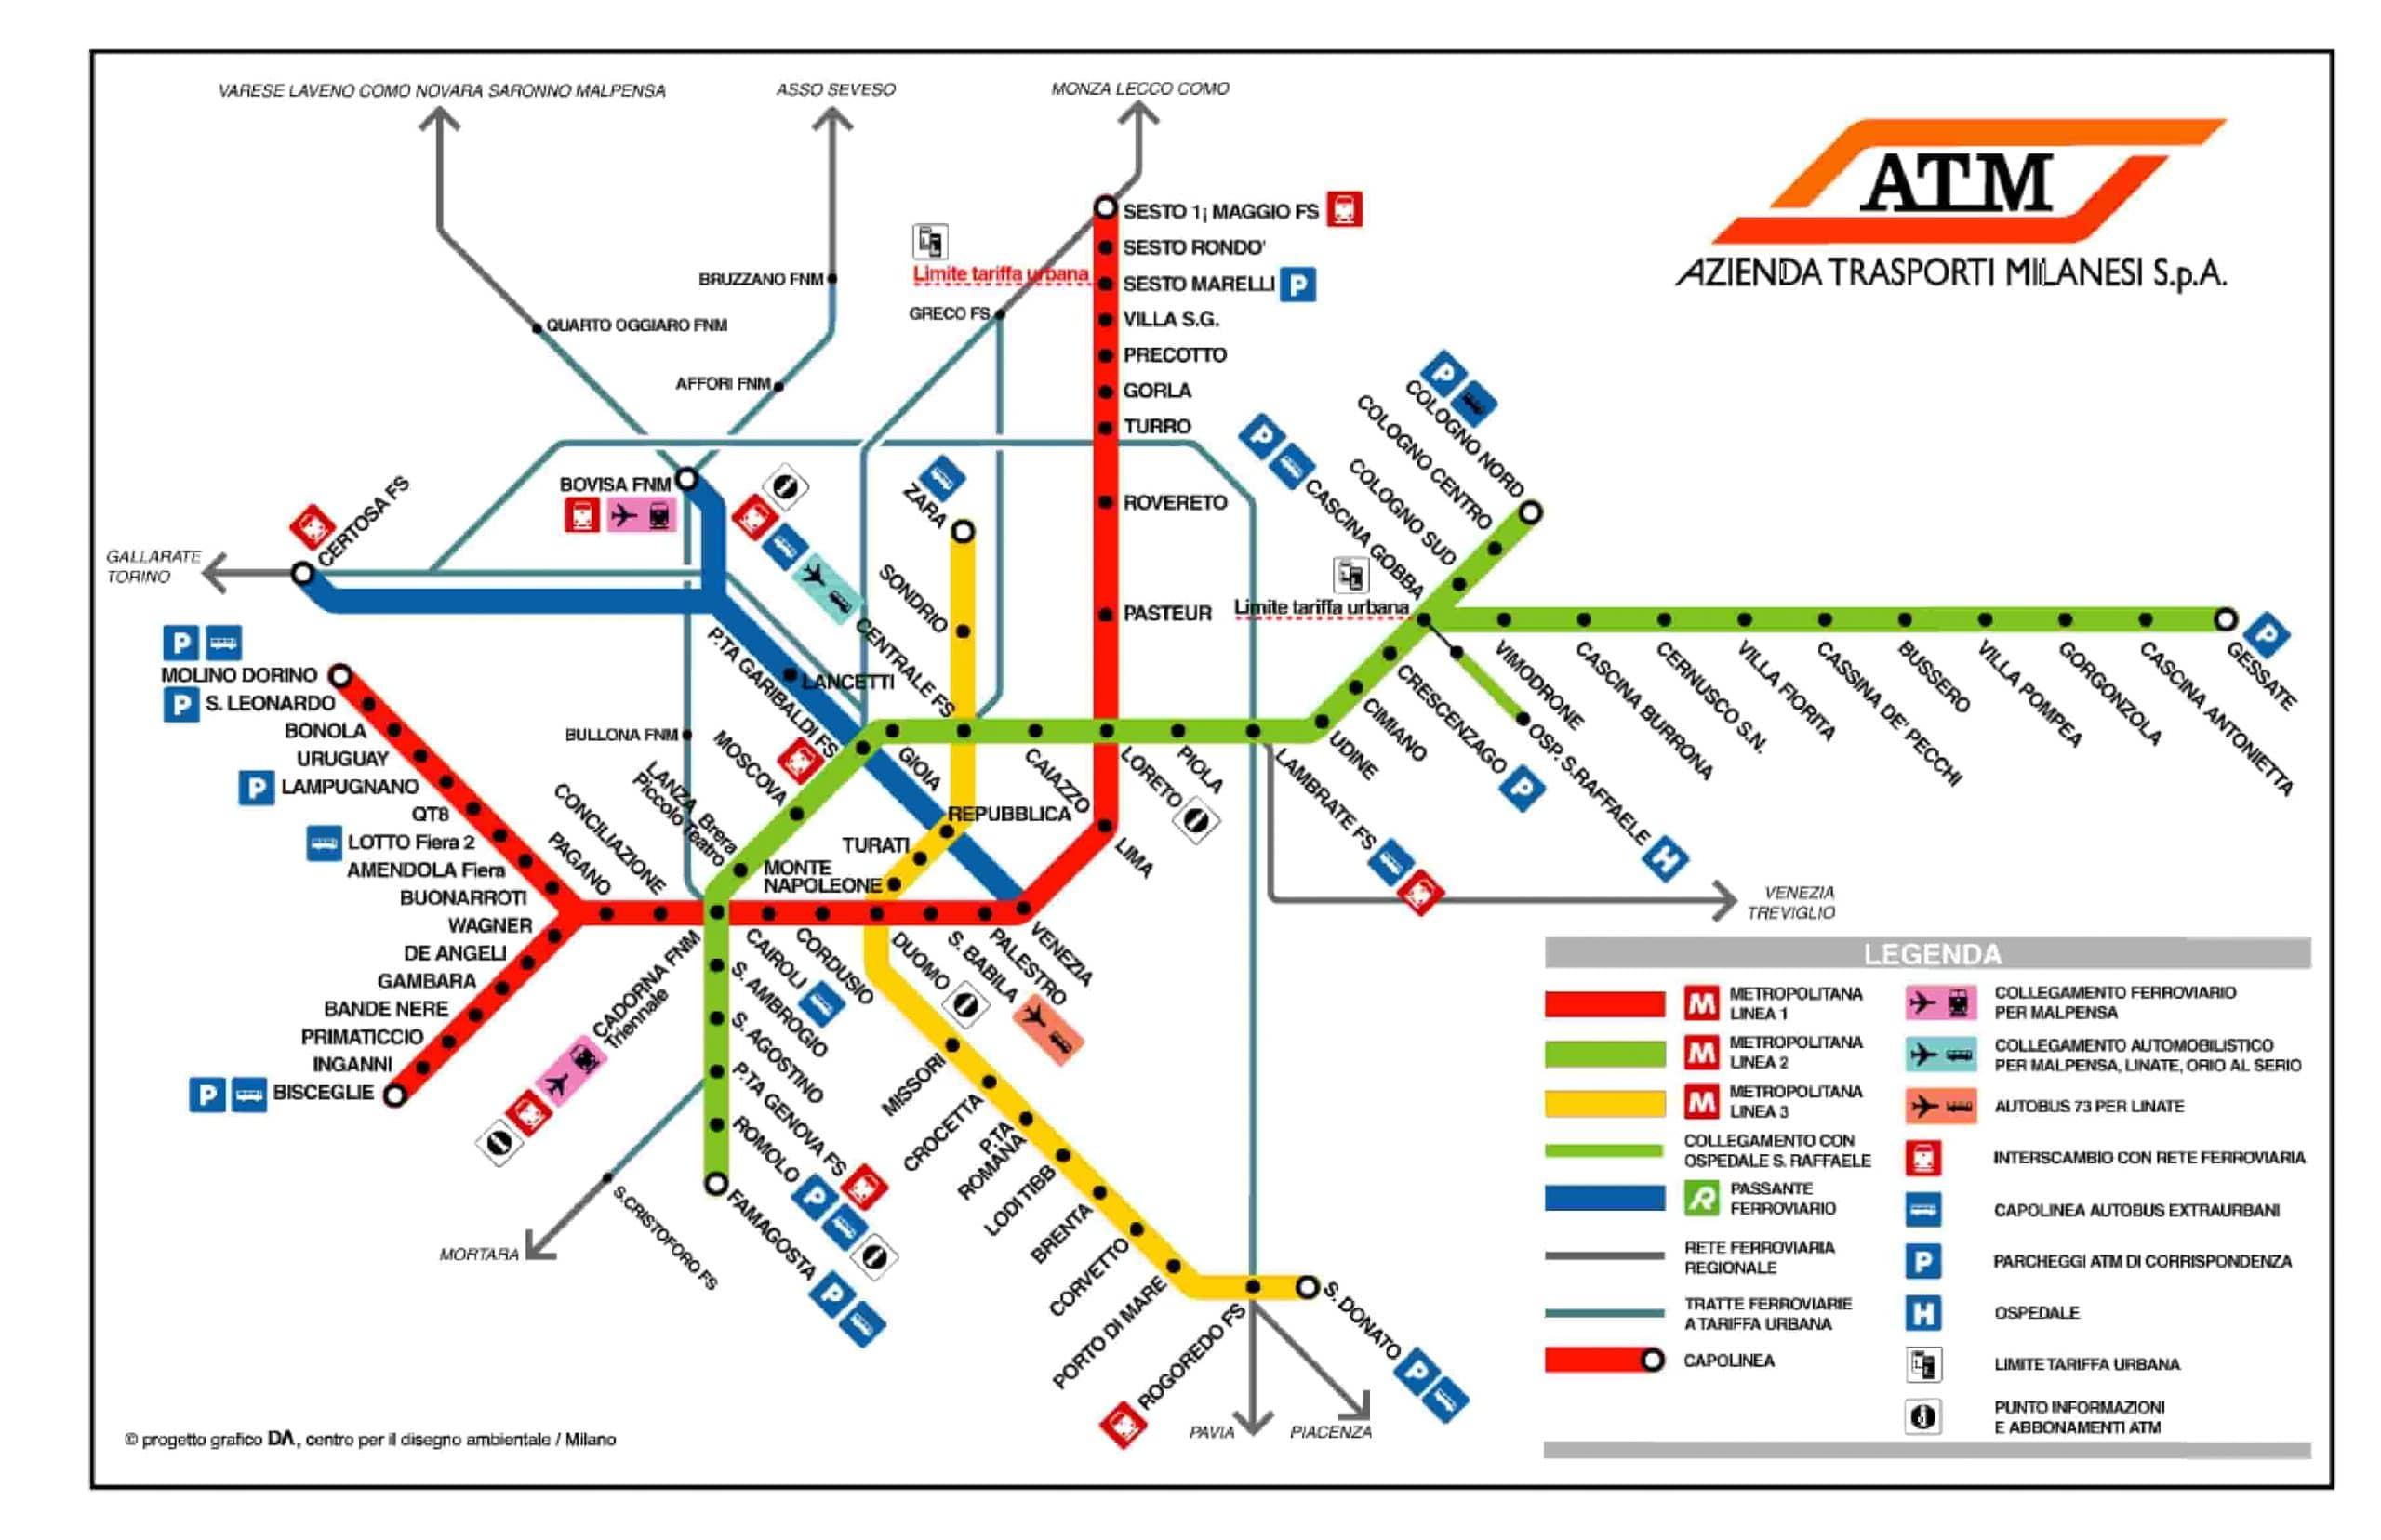 mappa-atm-metro-1999-1-min